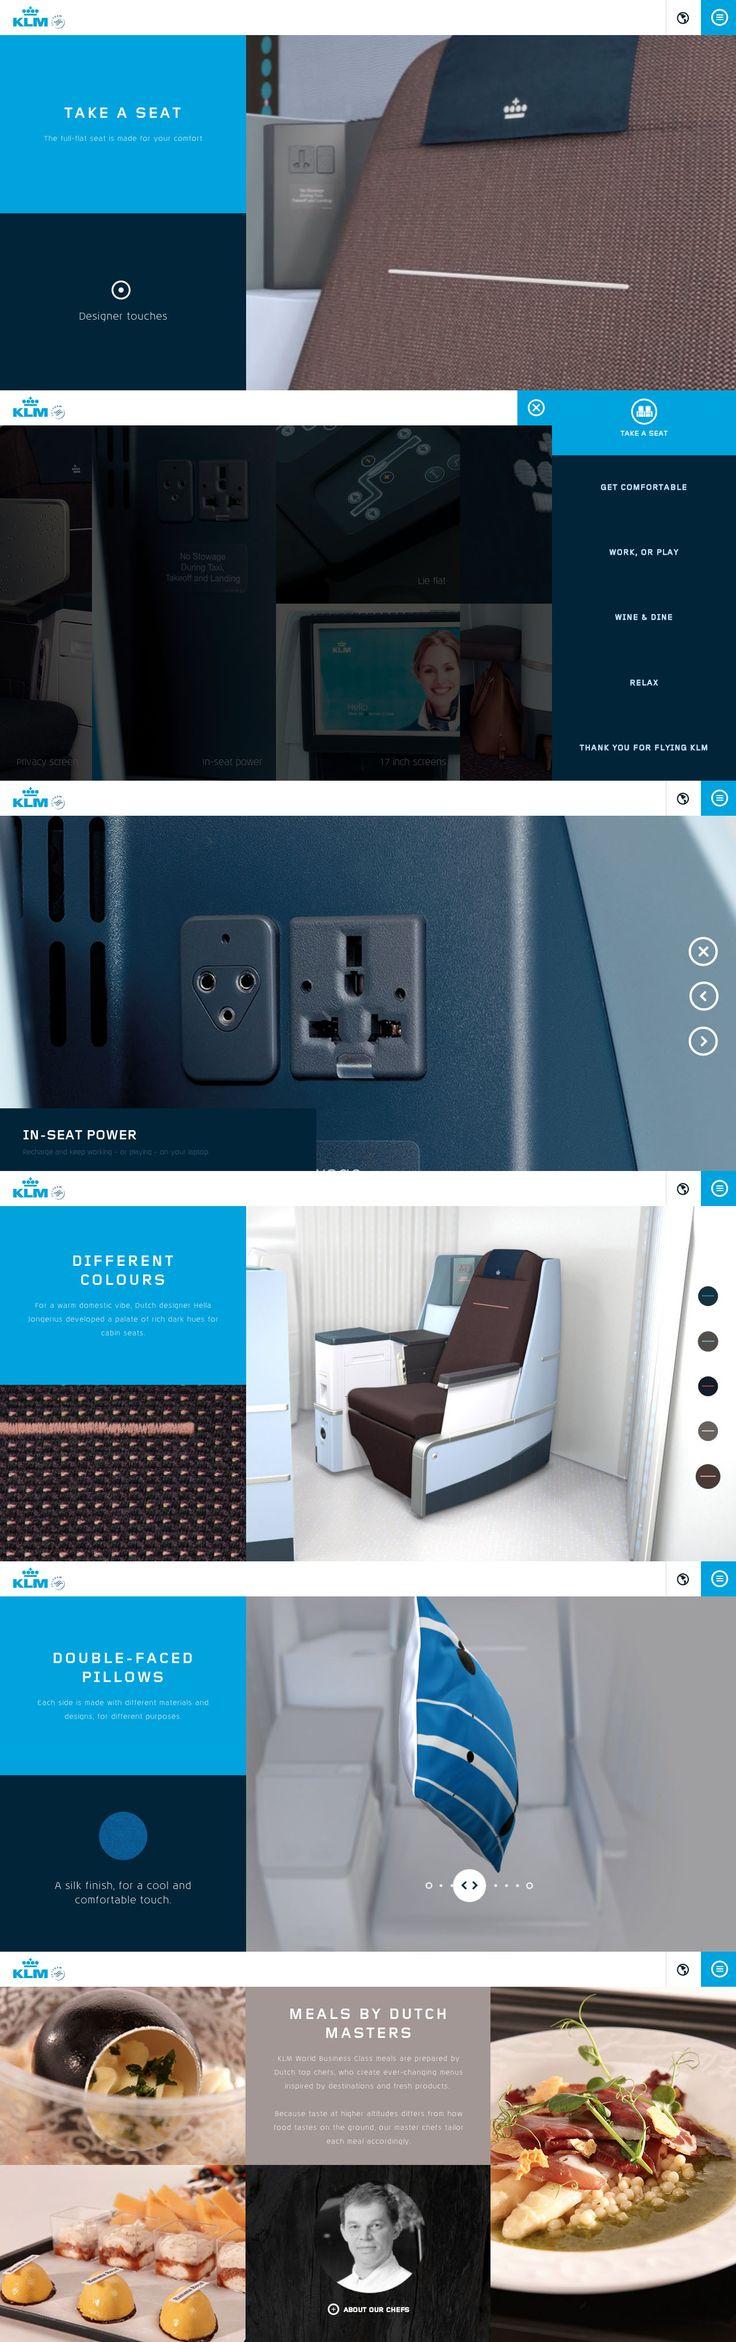 KLM - World Business Class  Clean, smooth & beautiful. http://wbc.klm.com